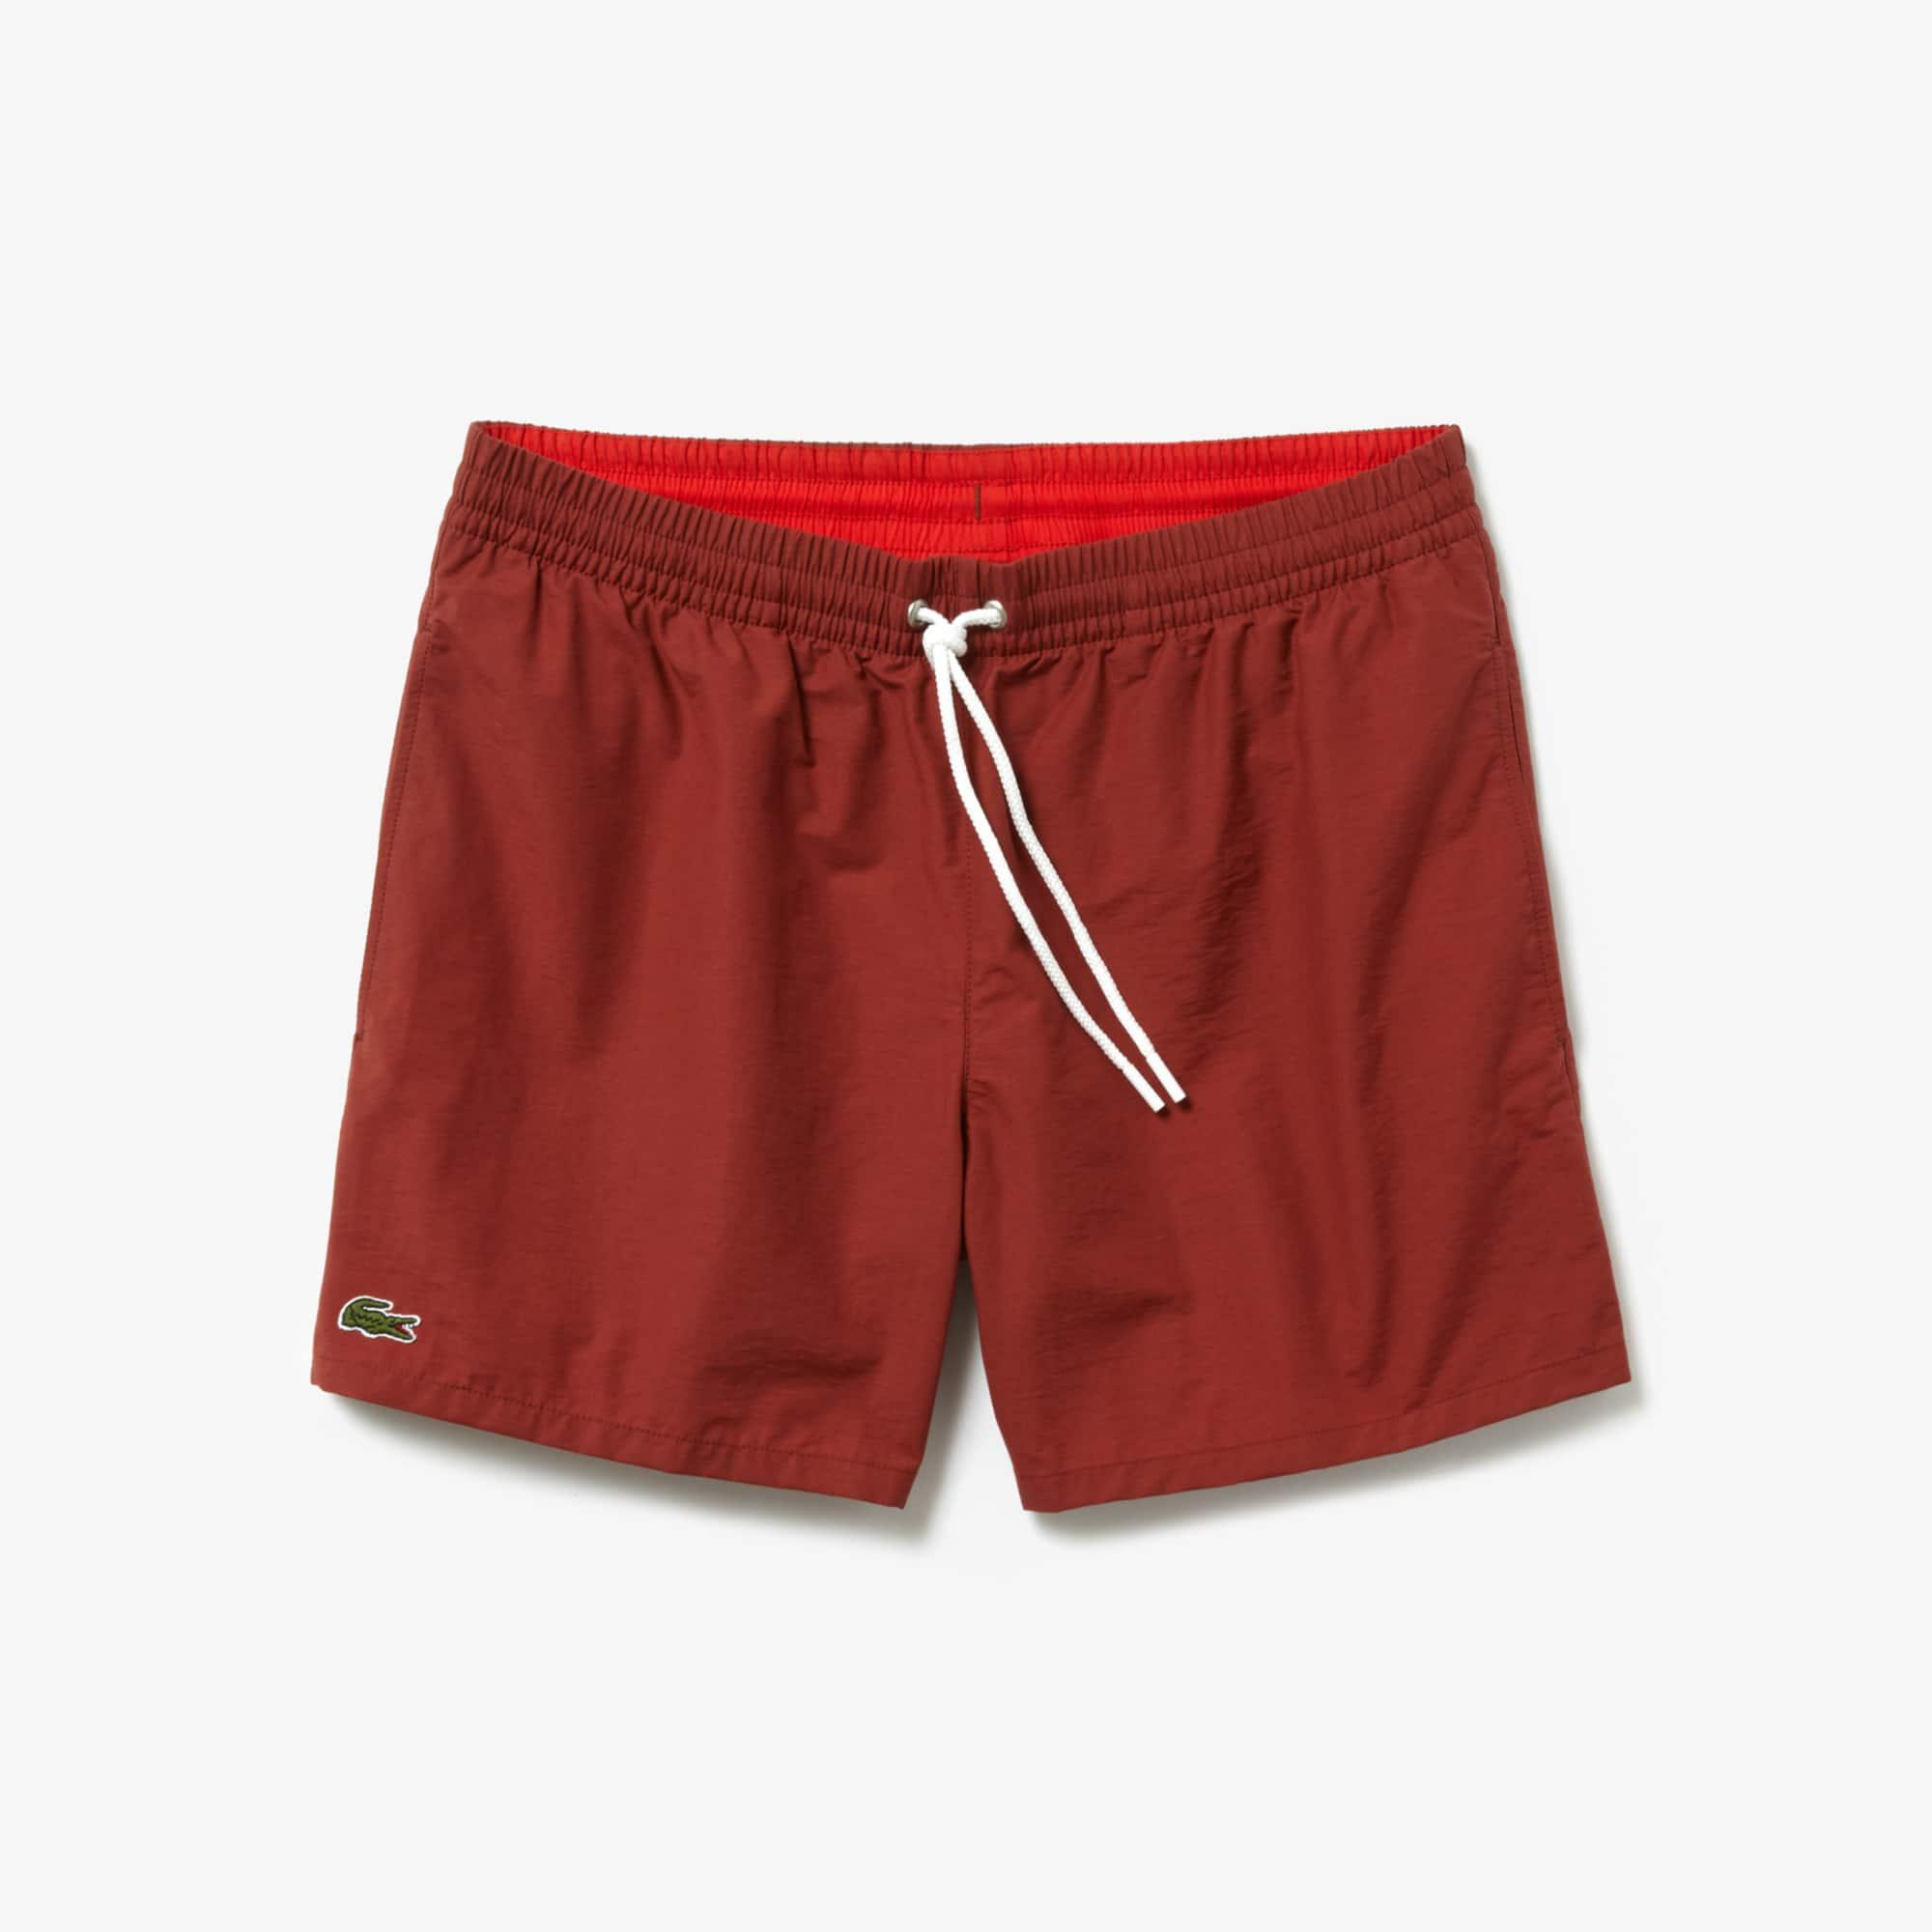 83ca1df2 Men's Swimming trunks in taffeta | LACOSTE